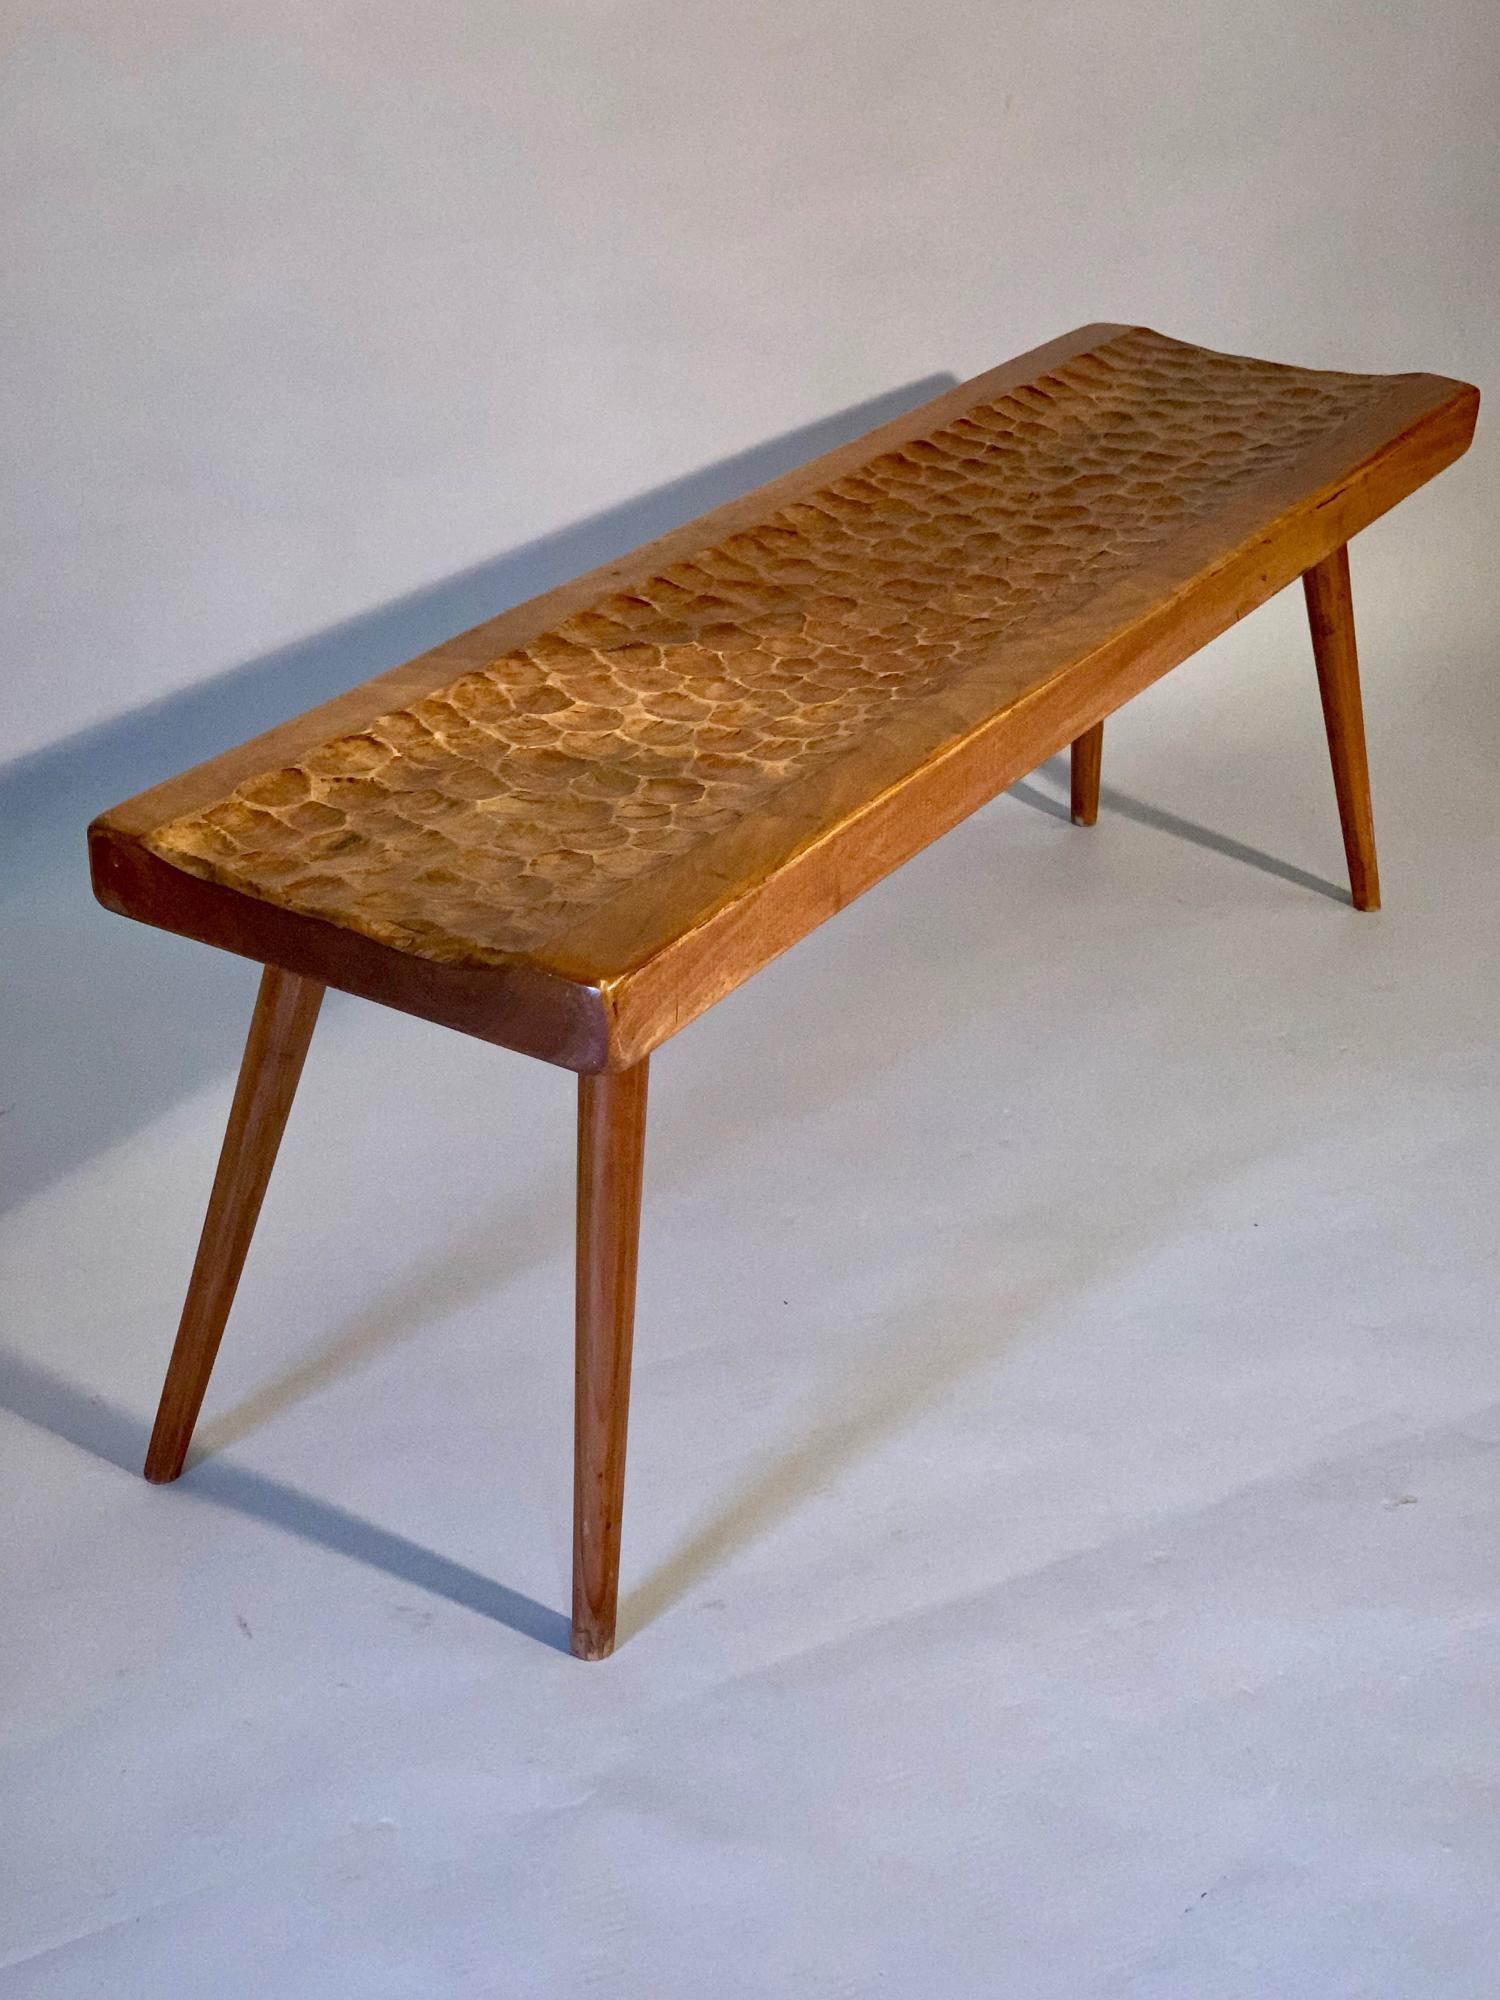 Scalloped walnut bench